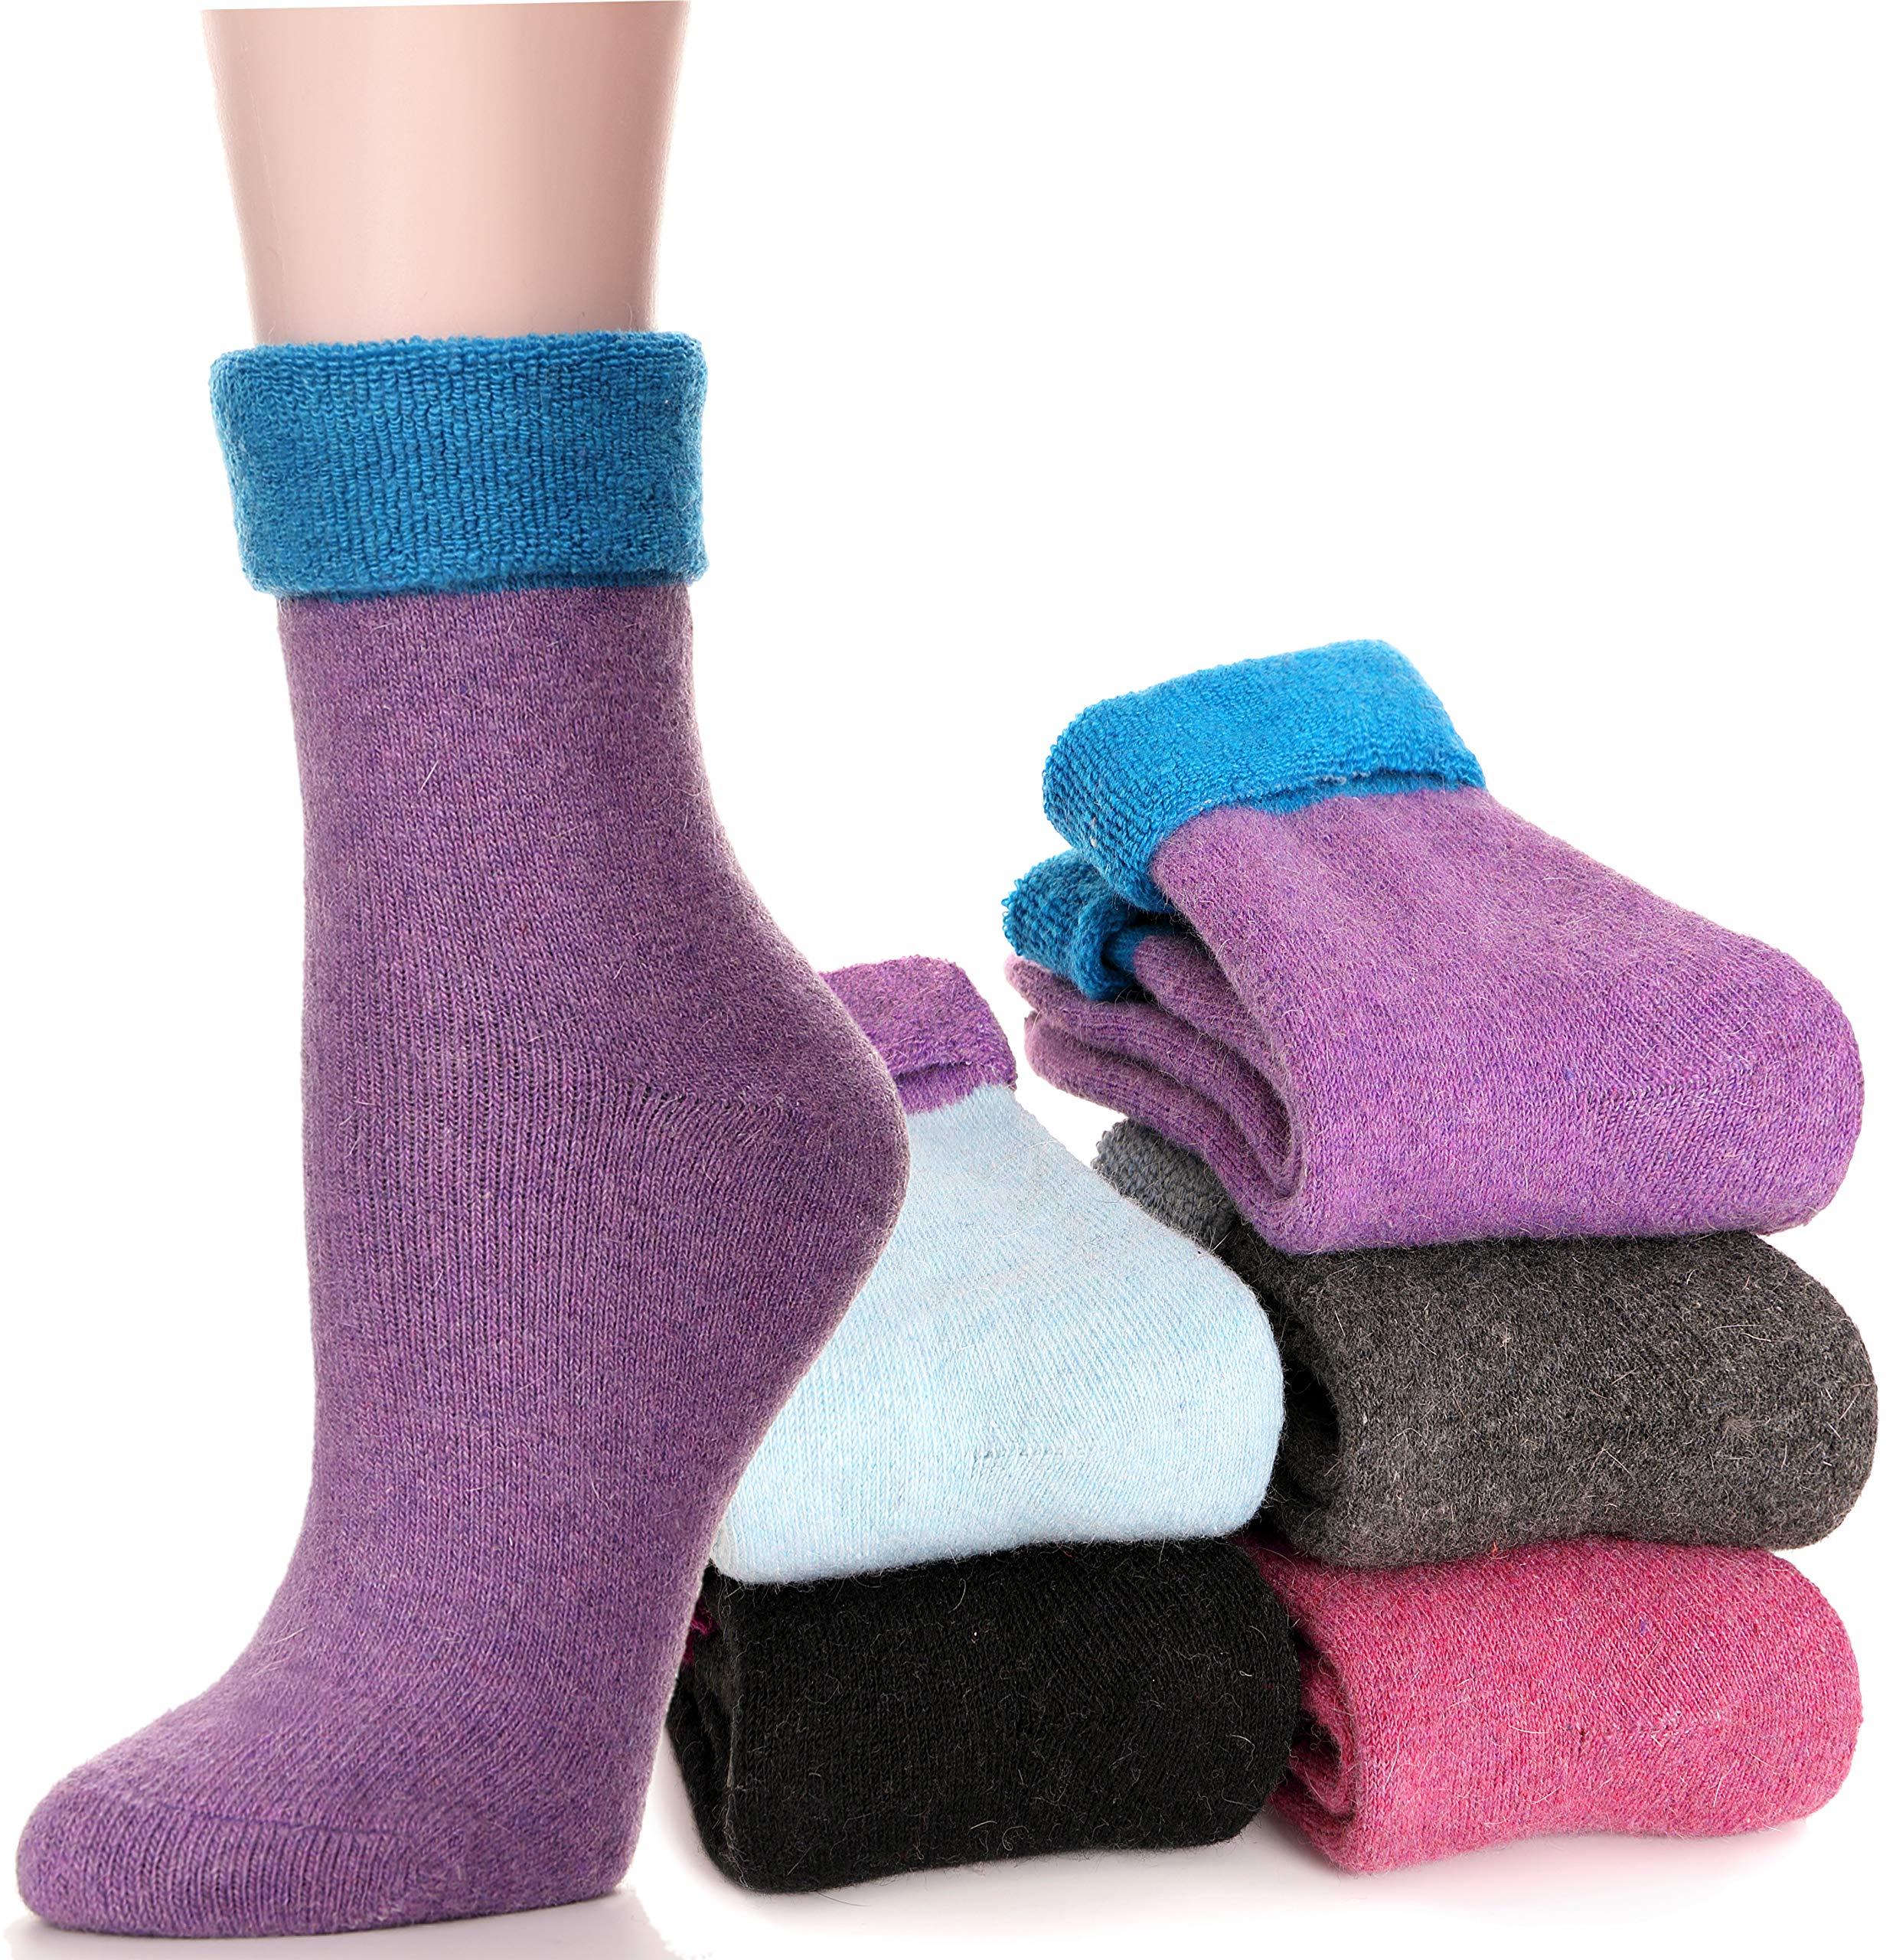 54d0047acda2e Women's Wool Tube Socks Fuzzy Heavy Thermal Thick Warm Winter Socks - 5  Pairs. HEAVY & WARM & FUZZY : The materials for this stylish socks is very  heavy, ...